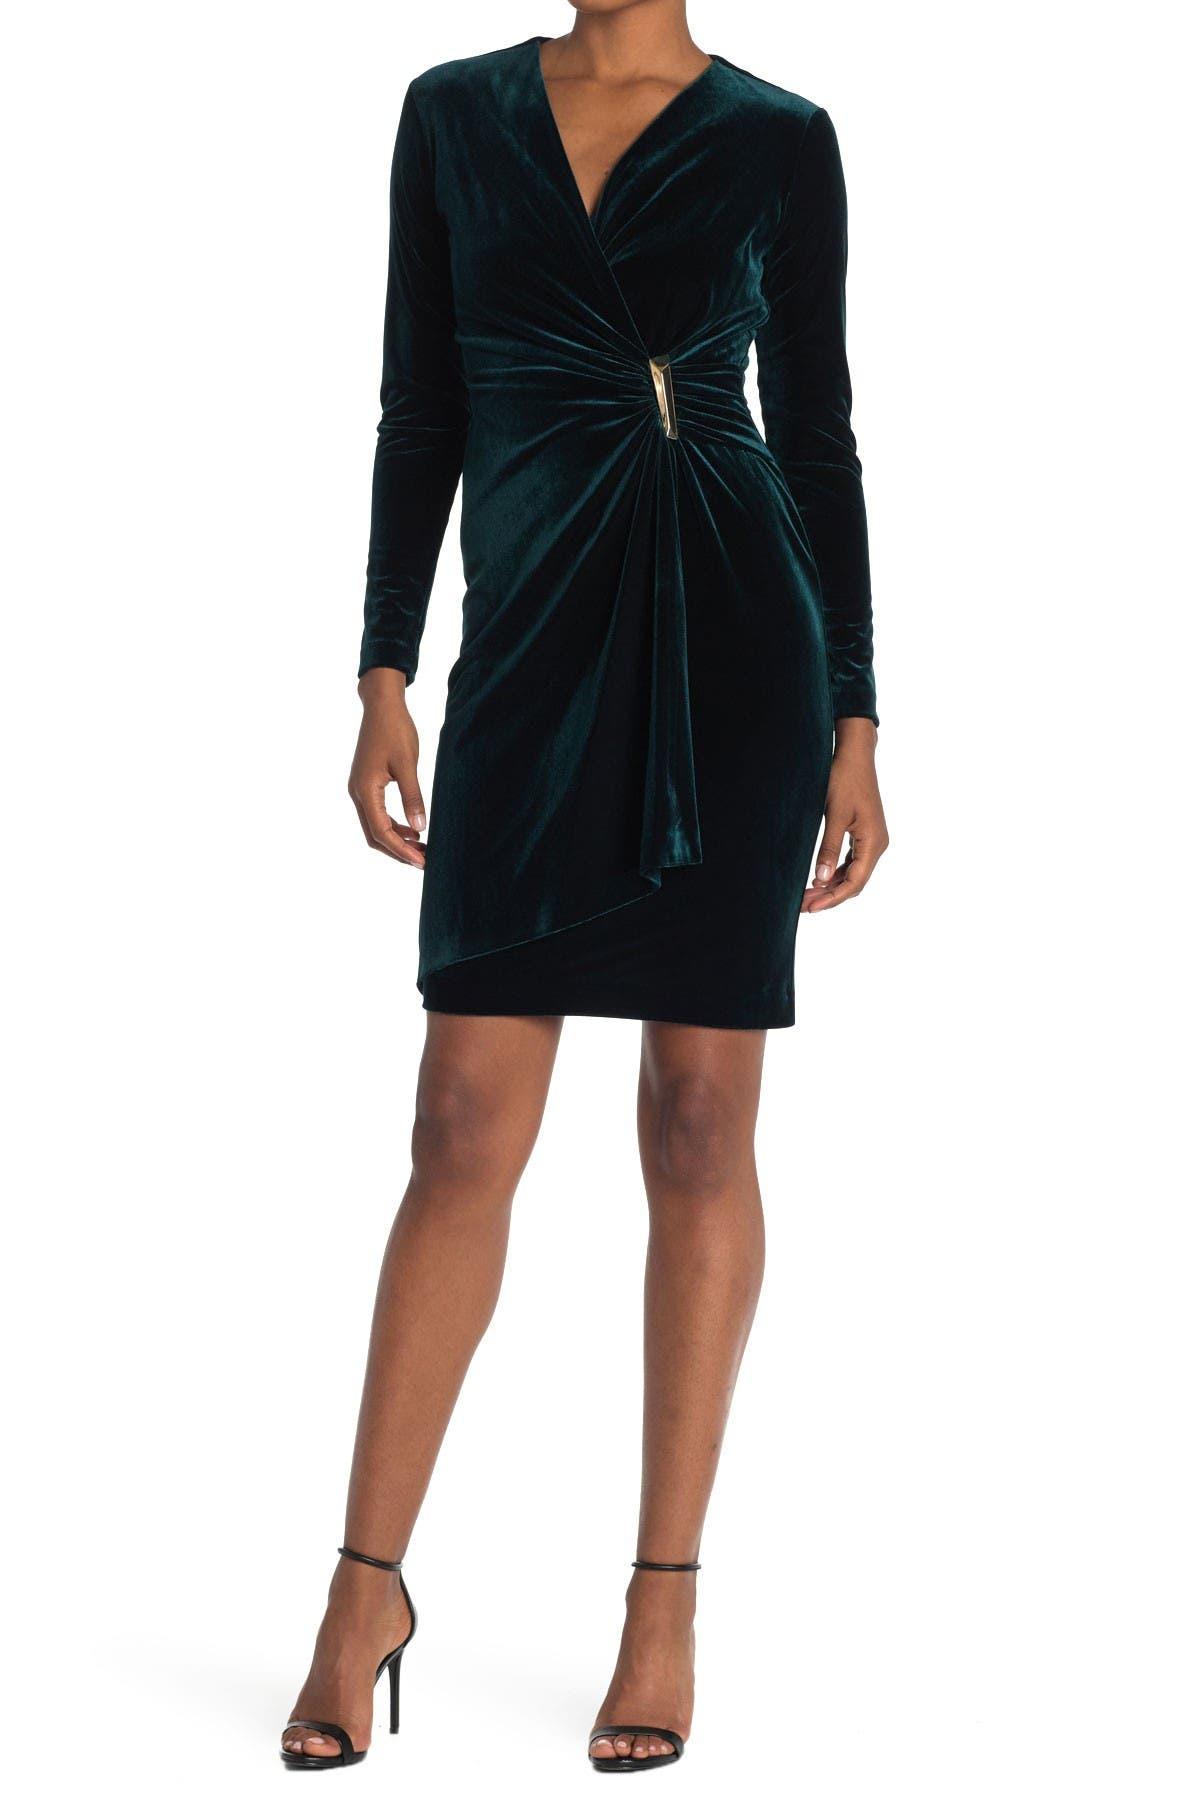 Image of Calvin Klein Velvet Faux Wrap Sheath Dress